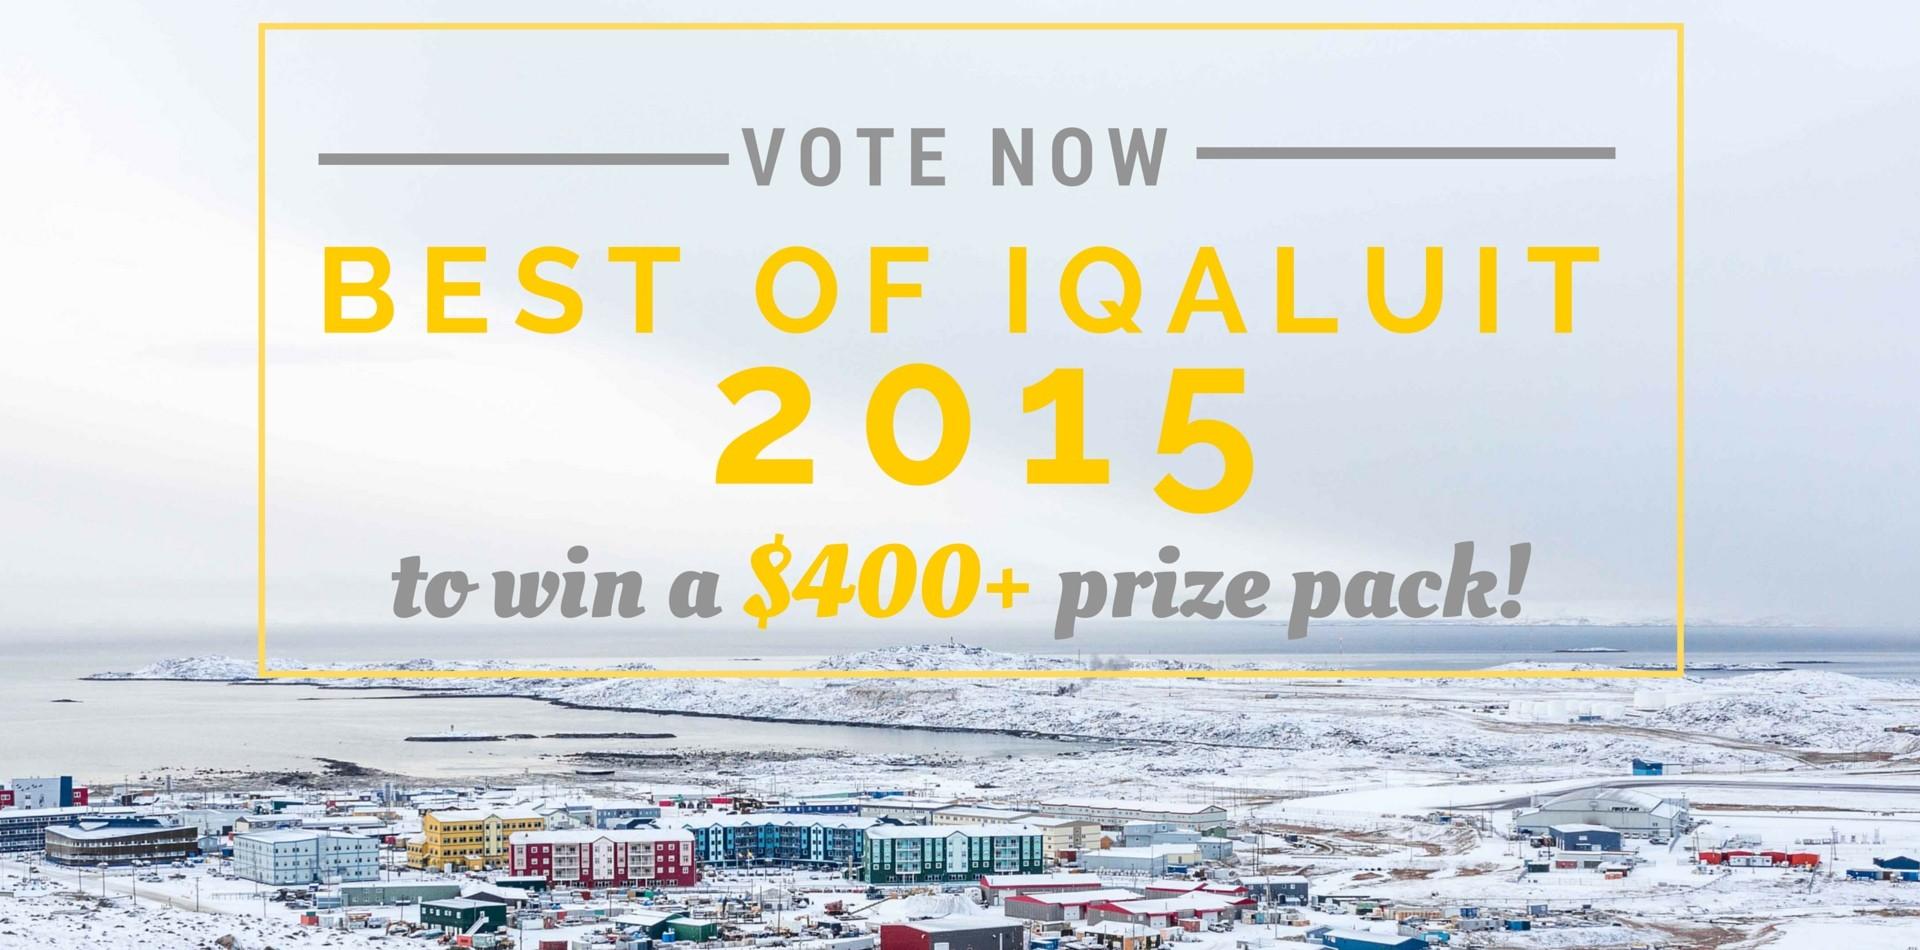 Best-of-Iqaluit-2015-e1449539845656.jpg